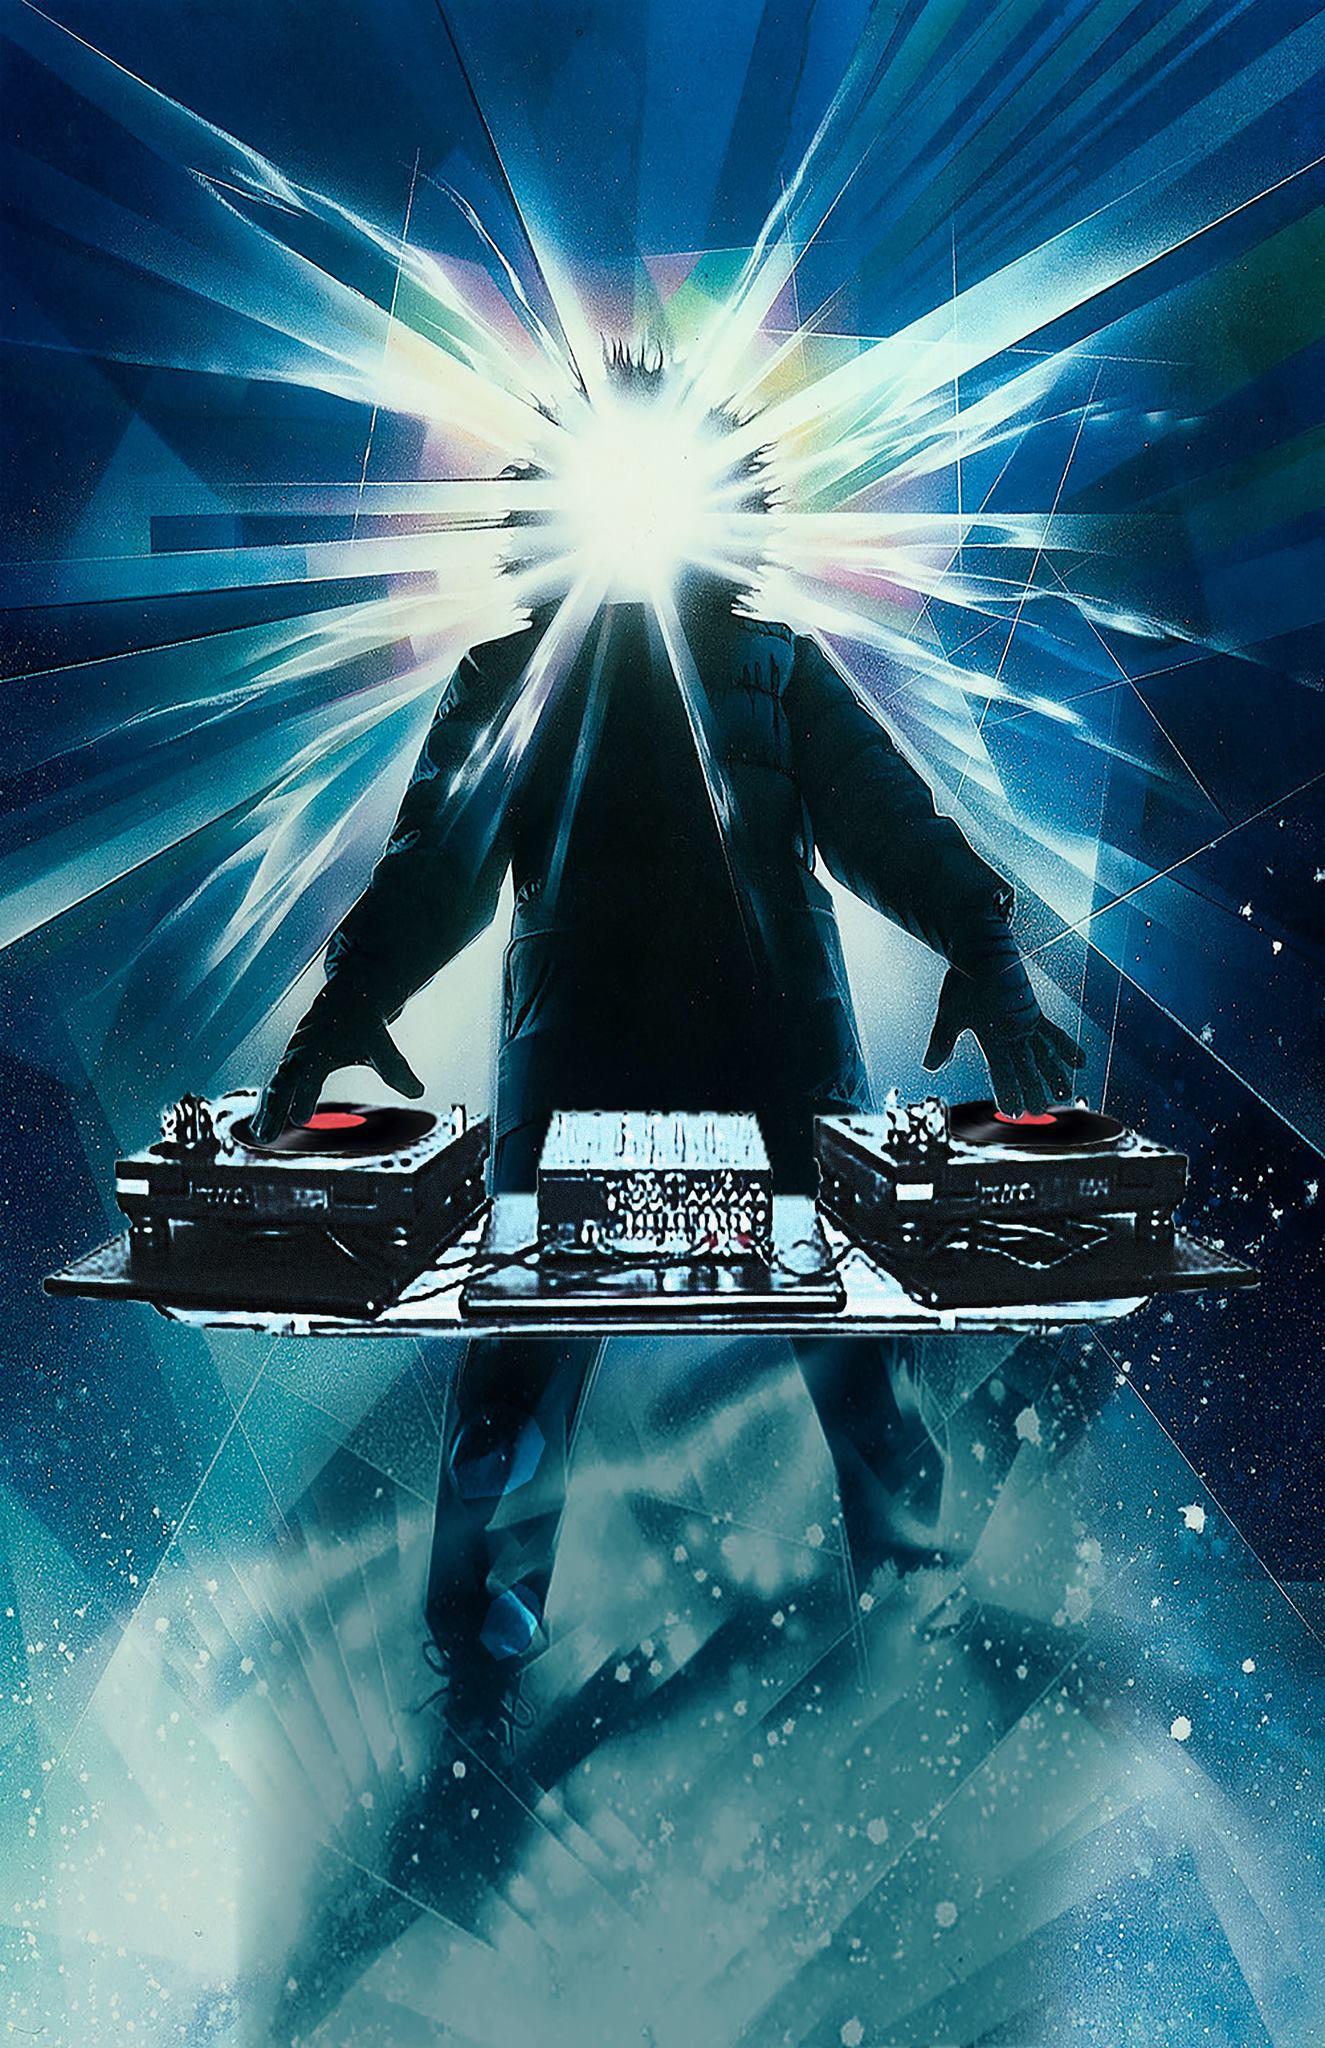 DJ_DONUT